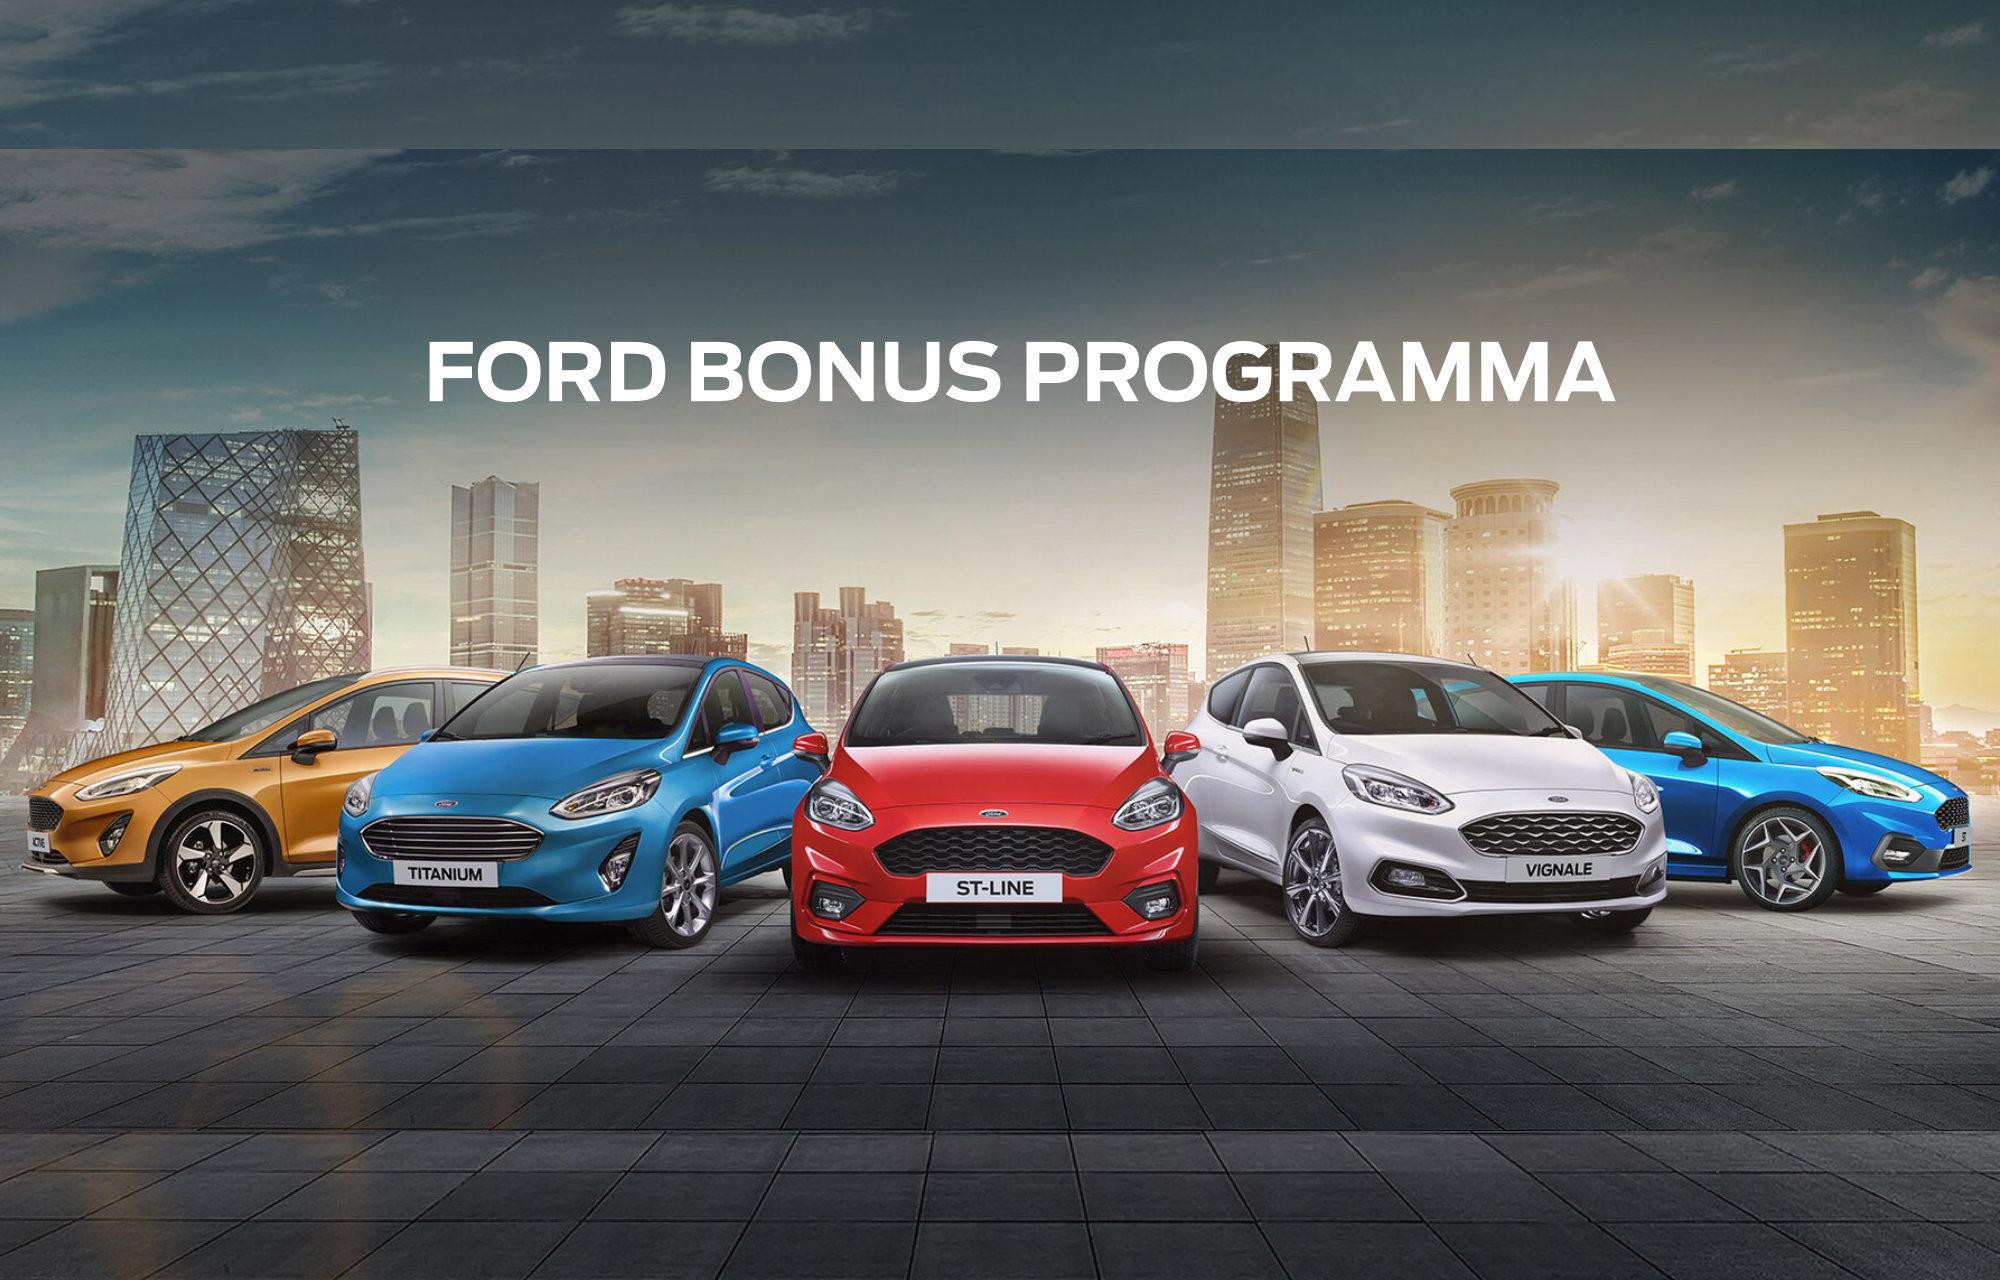 Ford Bonus Programma